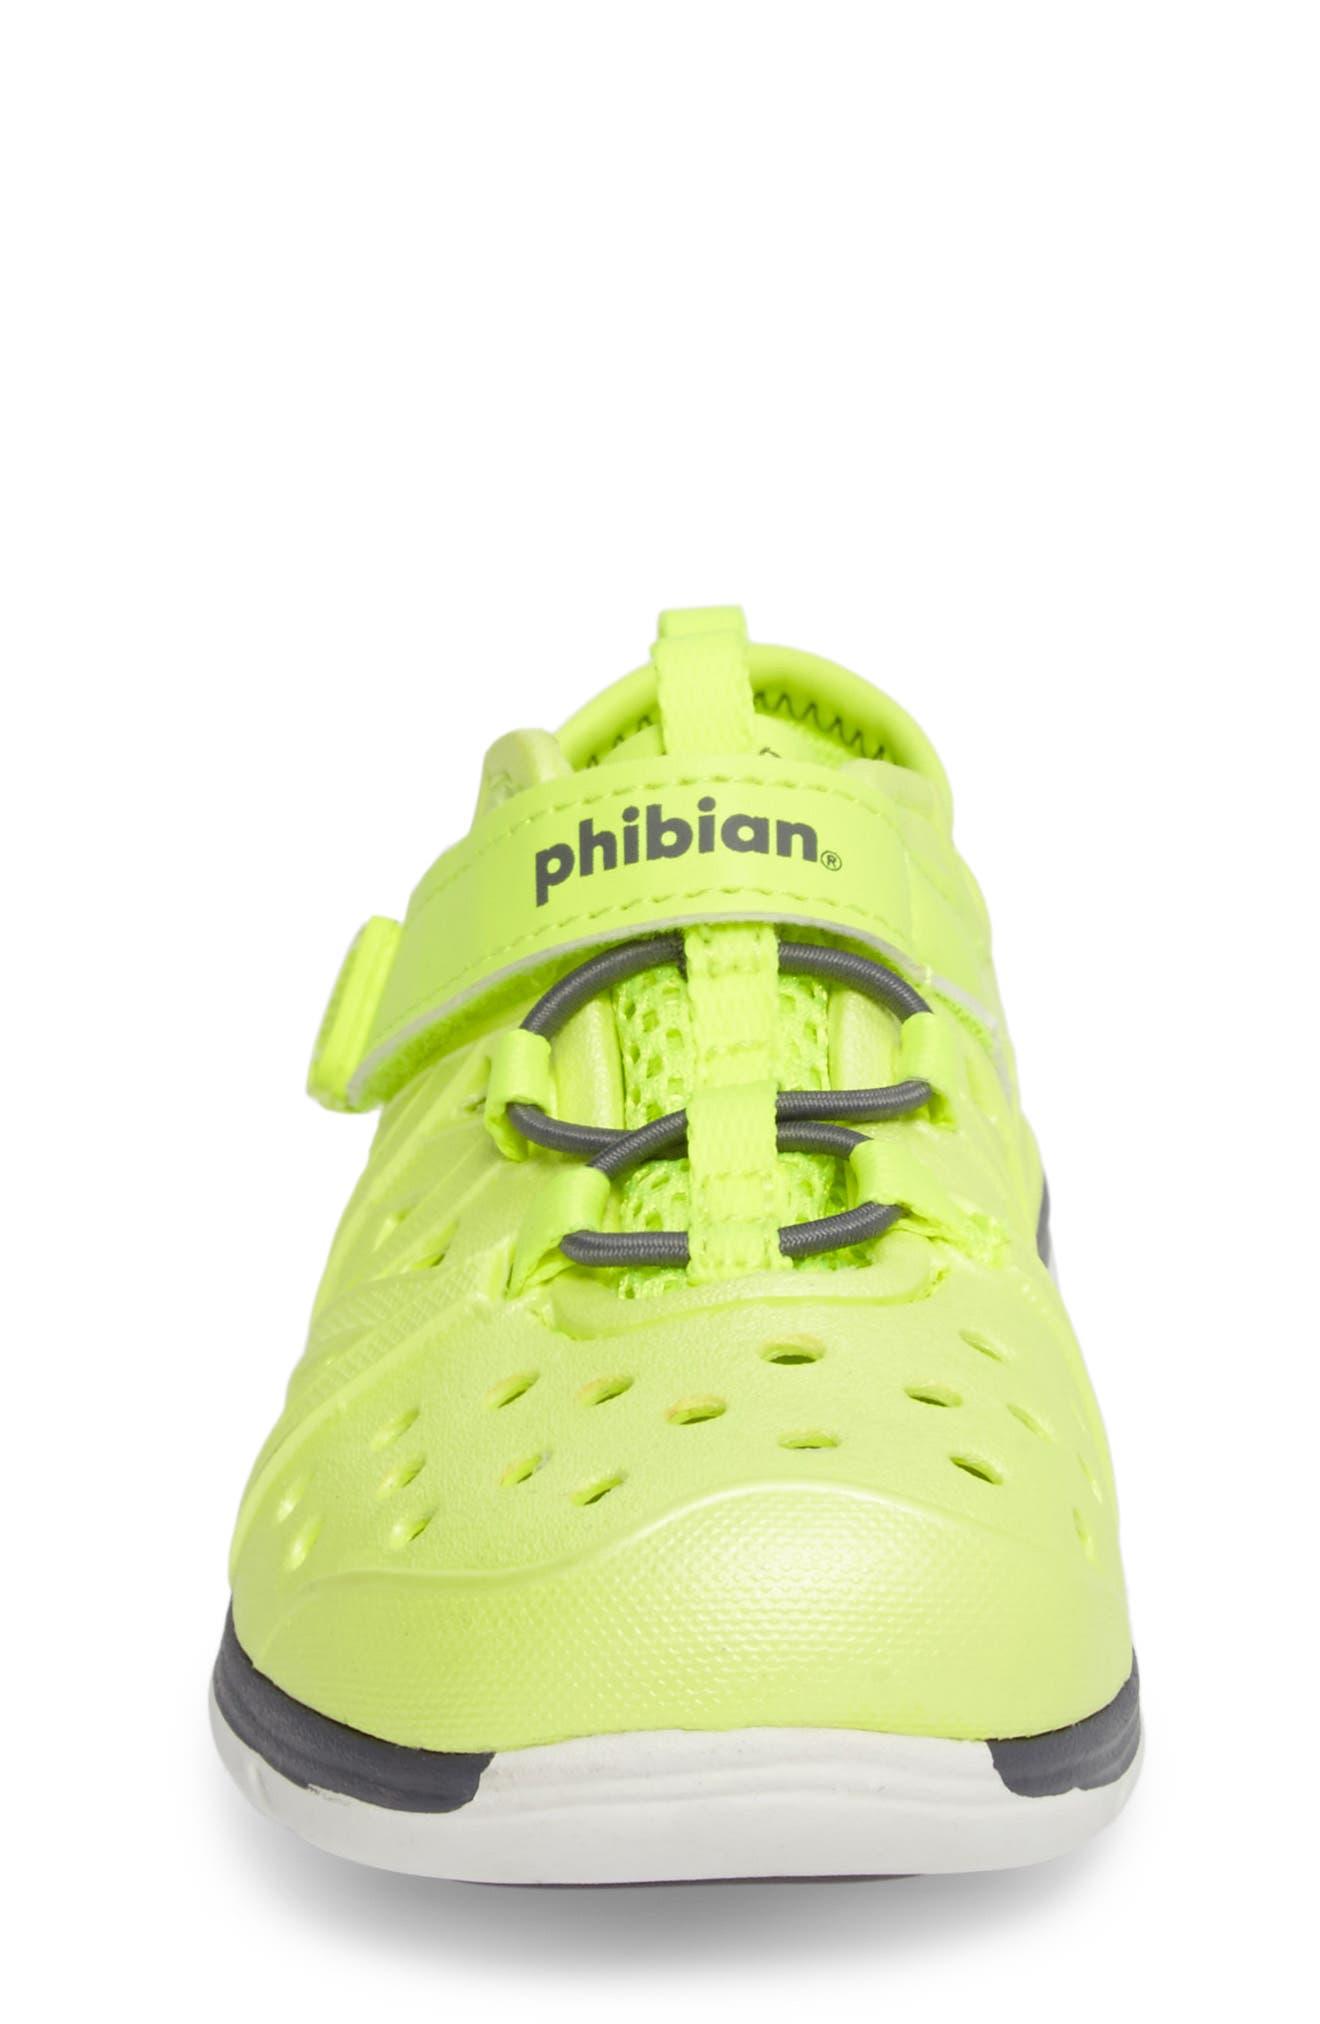 Made2Play<sup>®</sup> Phibian Sneaker,                             Alternate thumbnail 4, color,                             Citron Metallic